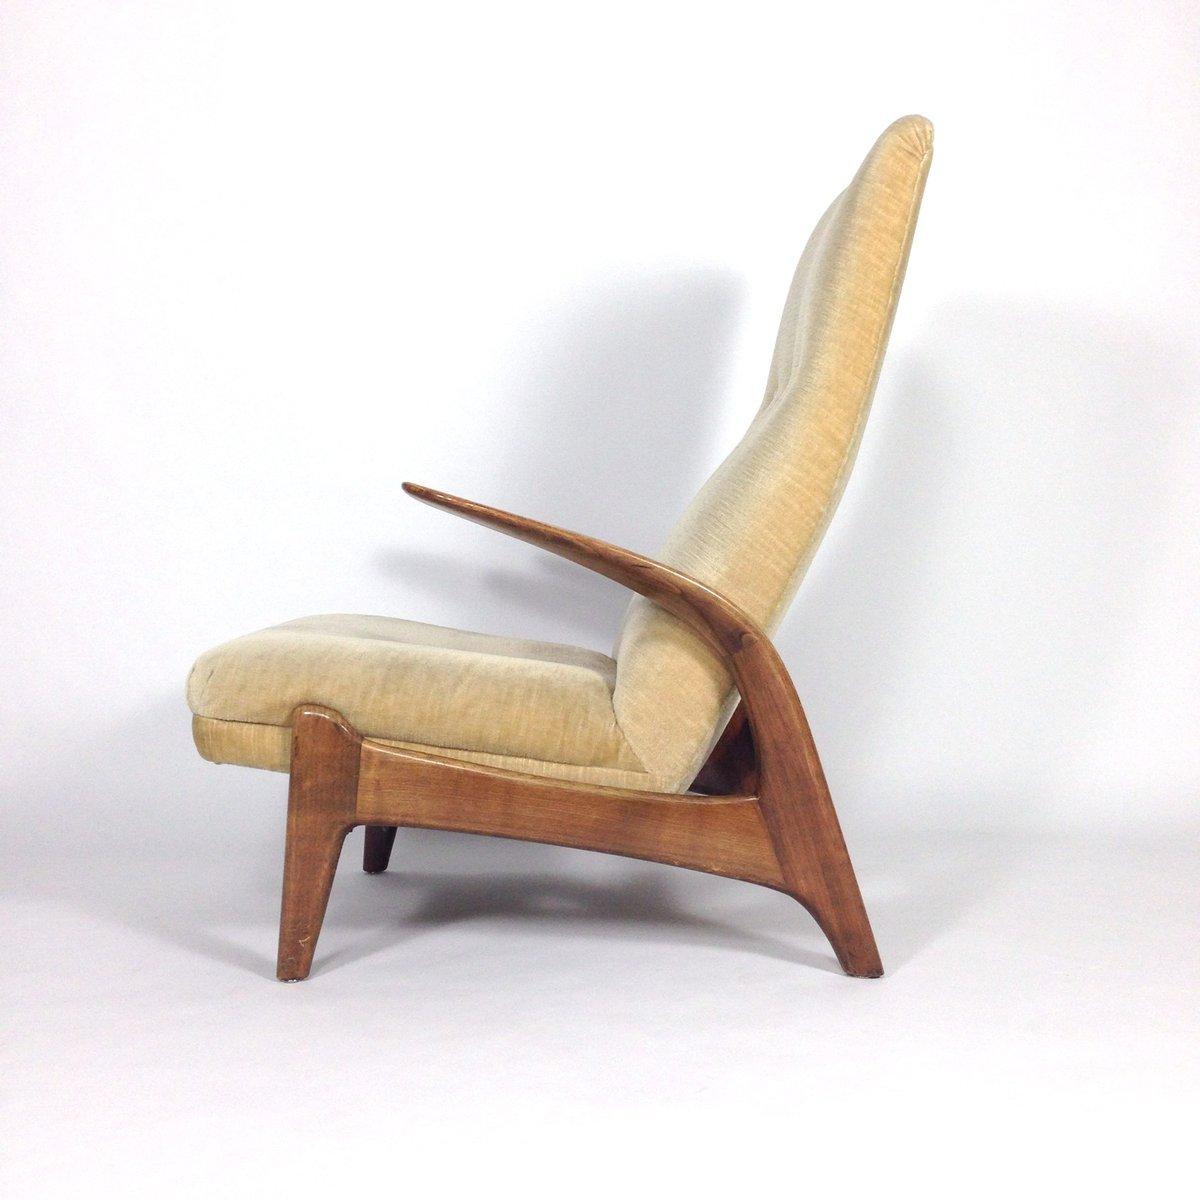 deer antler rocking chair wayfair chaise lounge chairs teak and velvet from gimson slater for sale